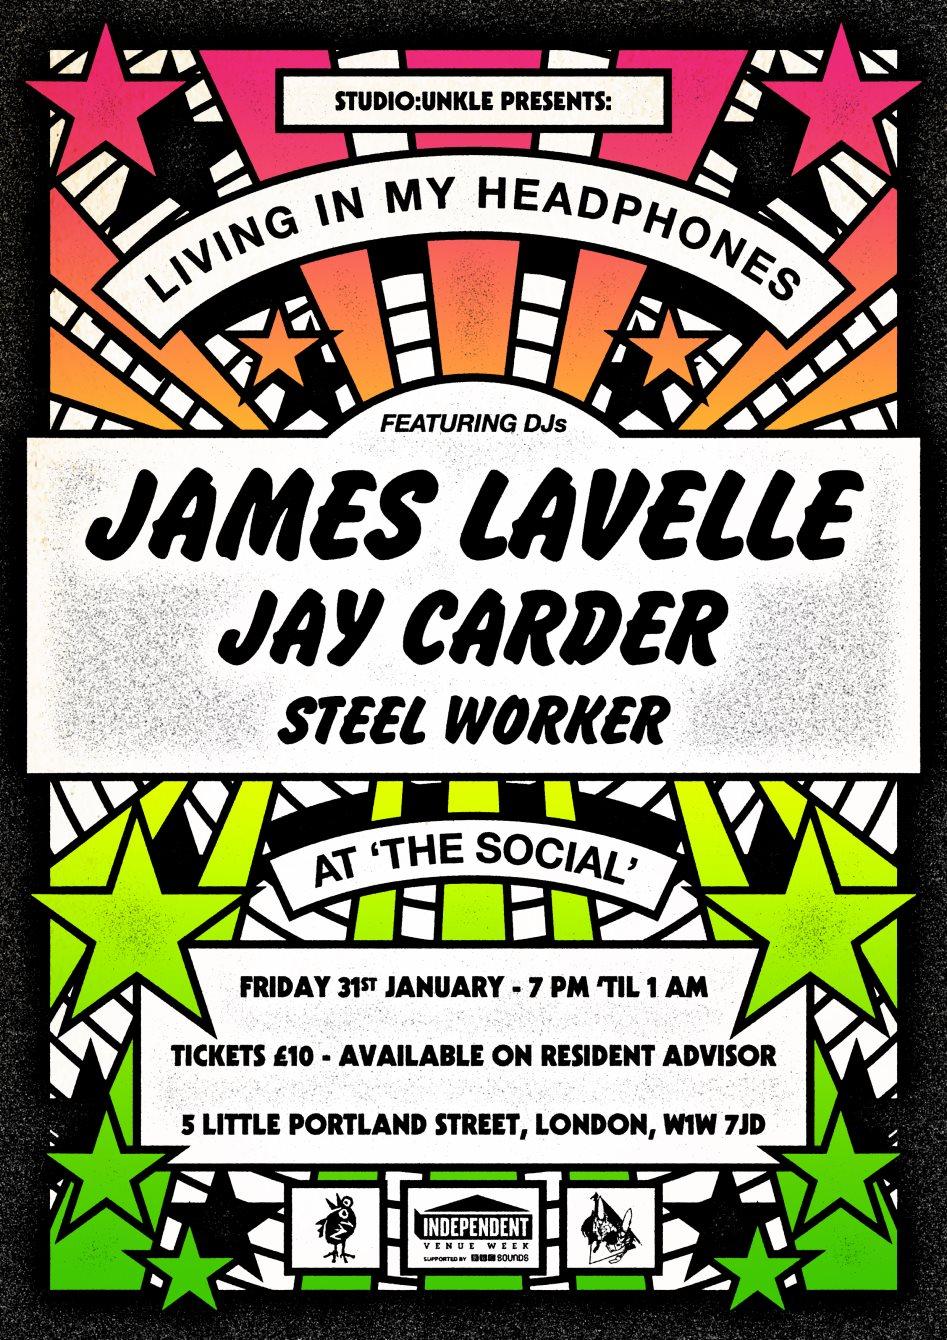 James Lavelle presents: Living In My Headphones - Flyer front